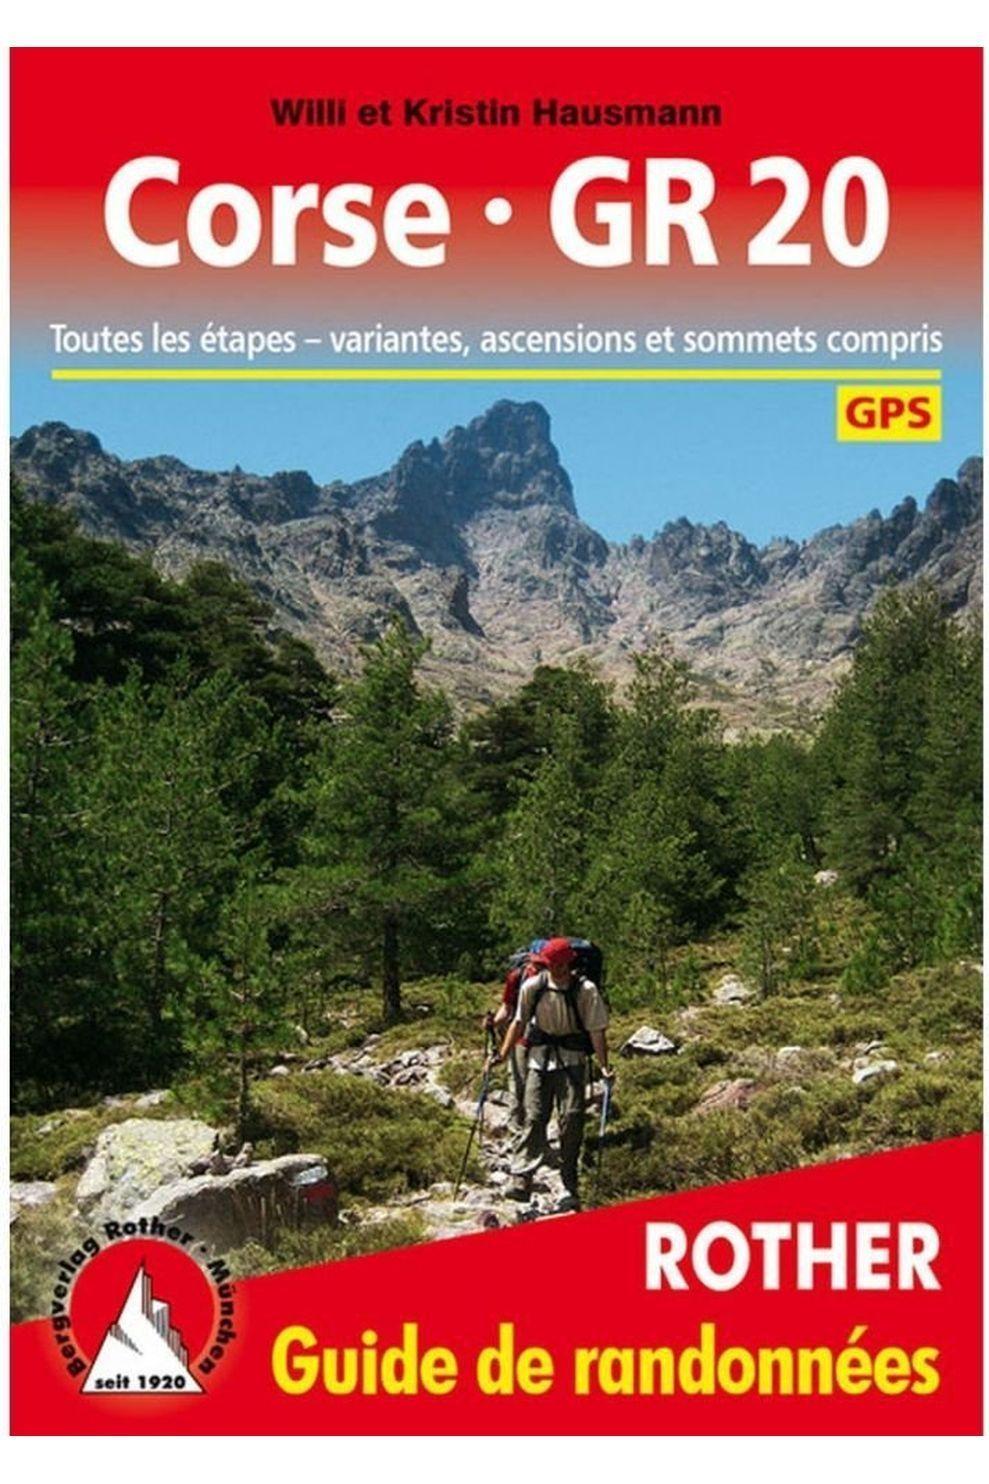 Rother Corse GR20 GPS guide rando - 2018